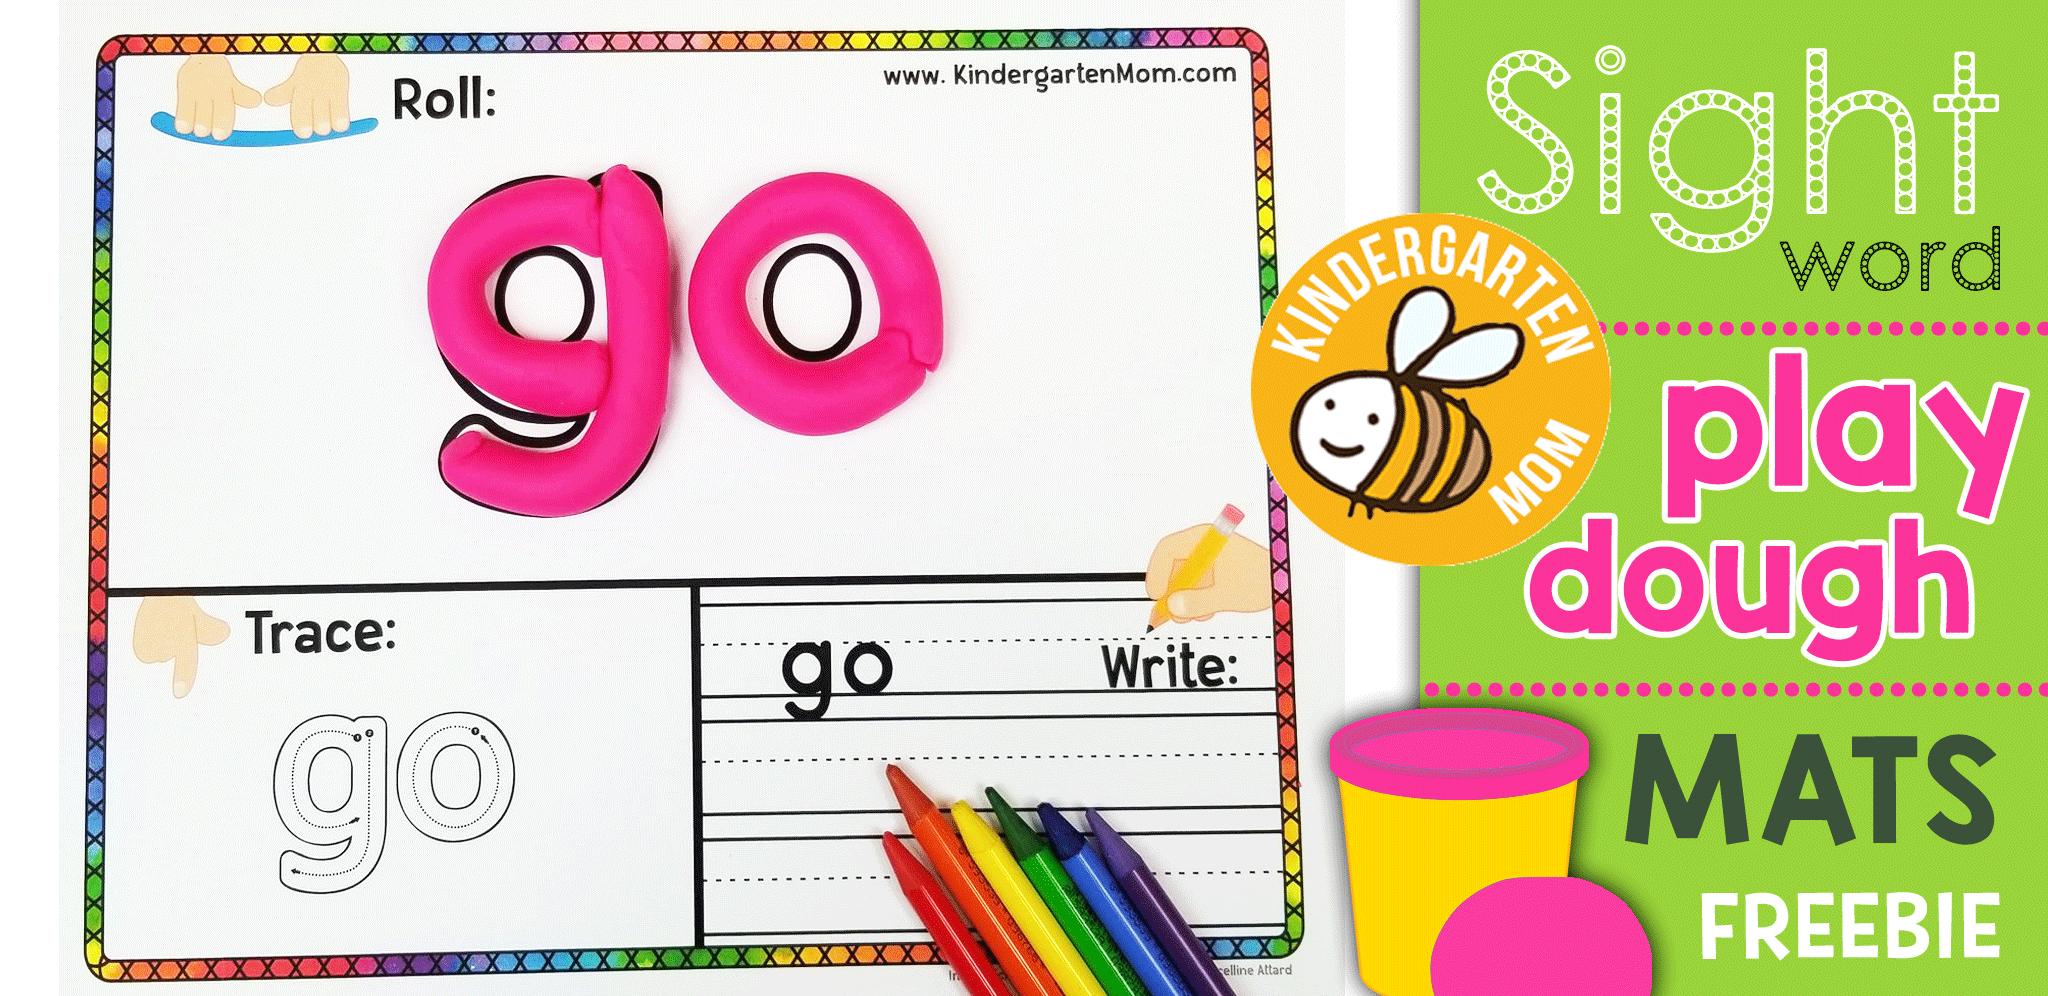 Sight Word Play Dough Mats - Kindergarten Mom for Name Tracing Mats